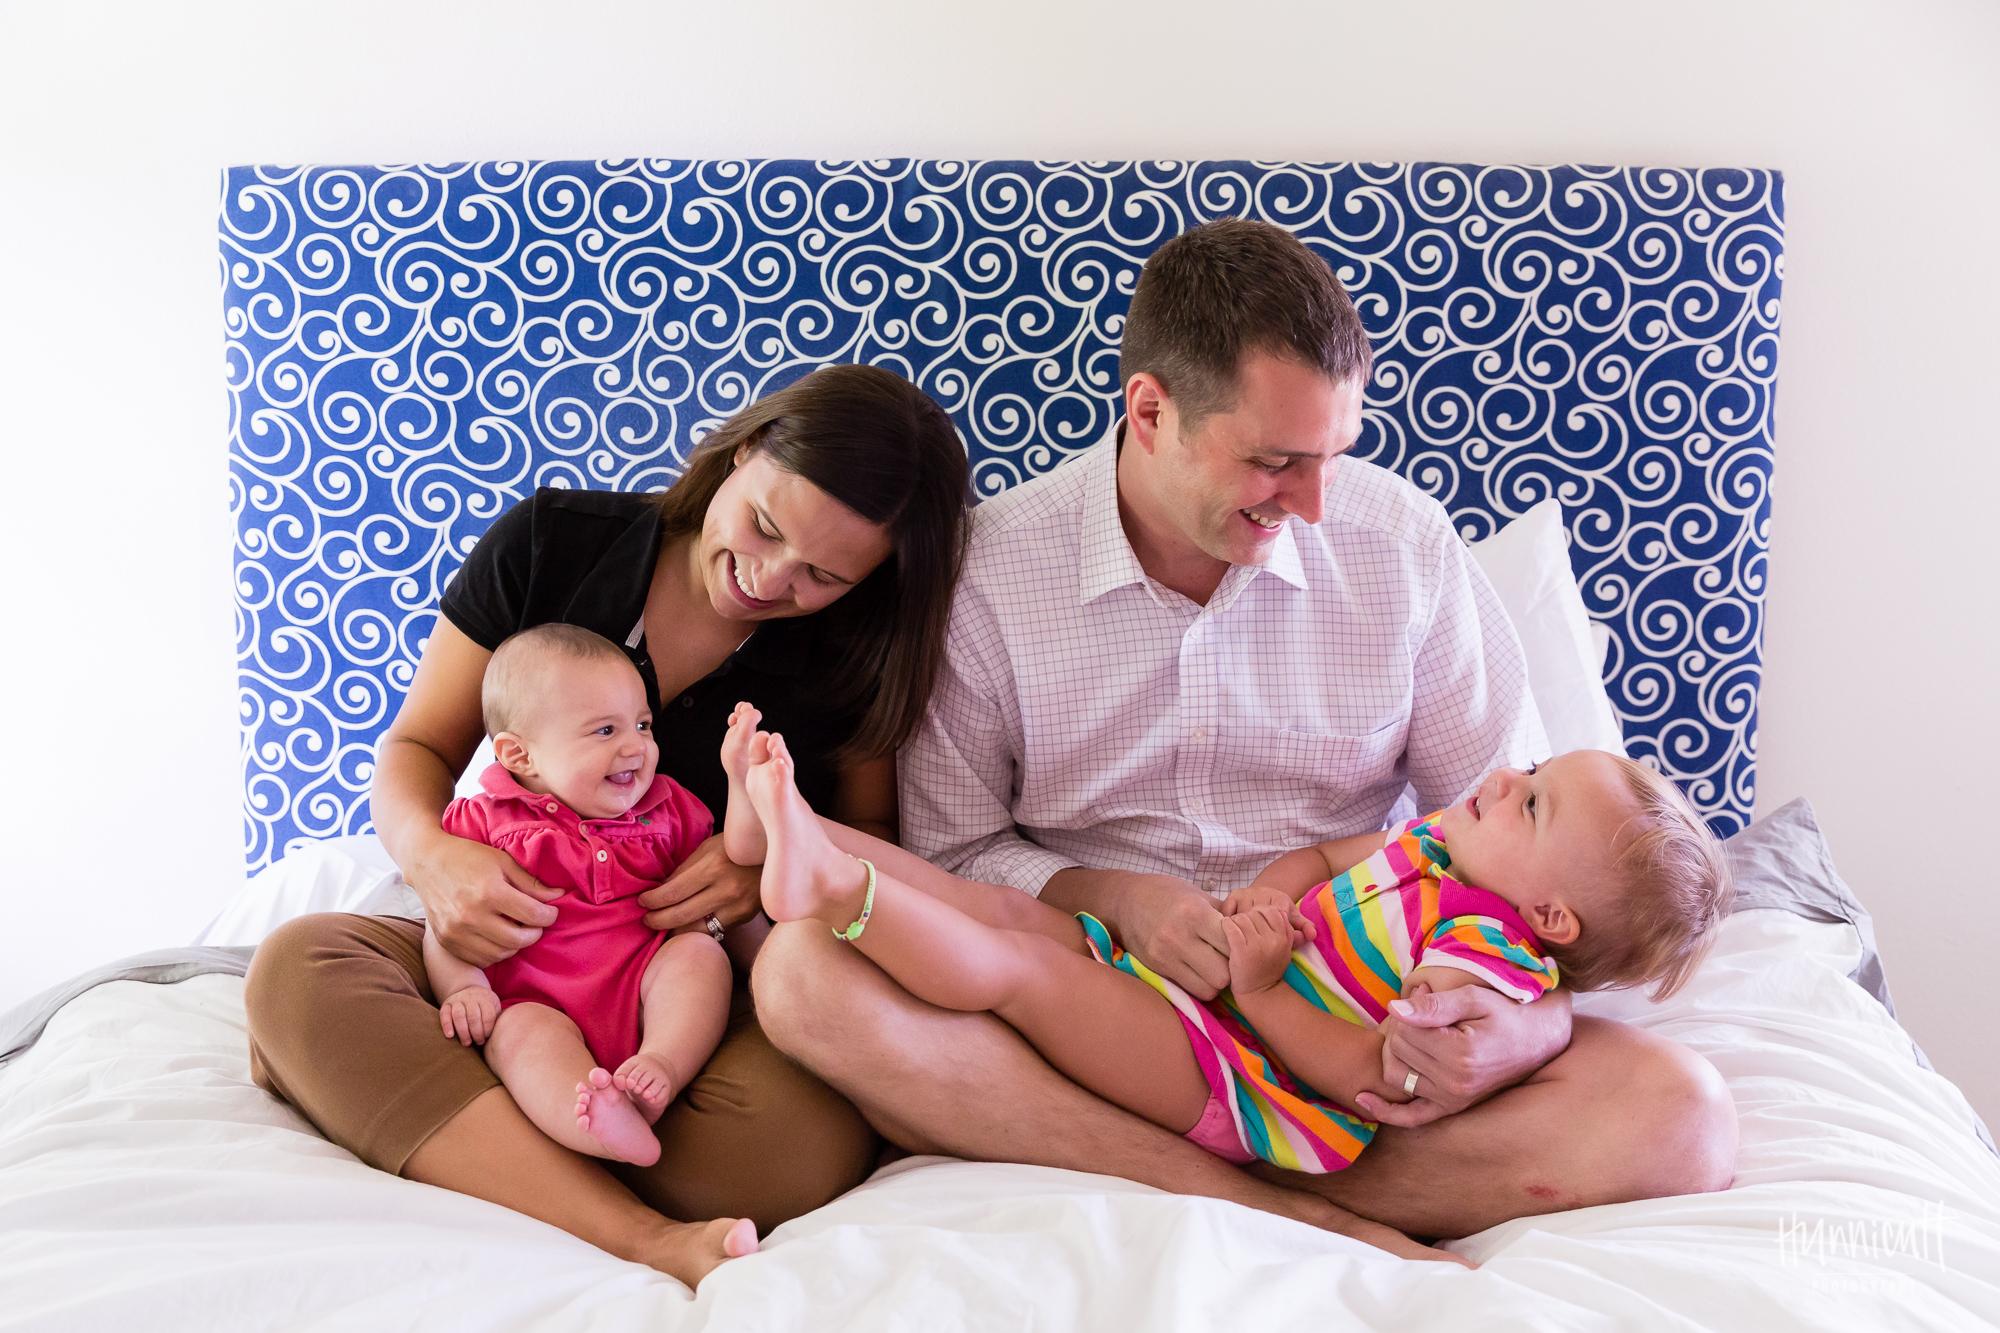 Indoor-Lifestyle-Texas-Family-Hunnicutt-5